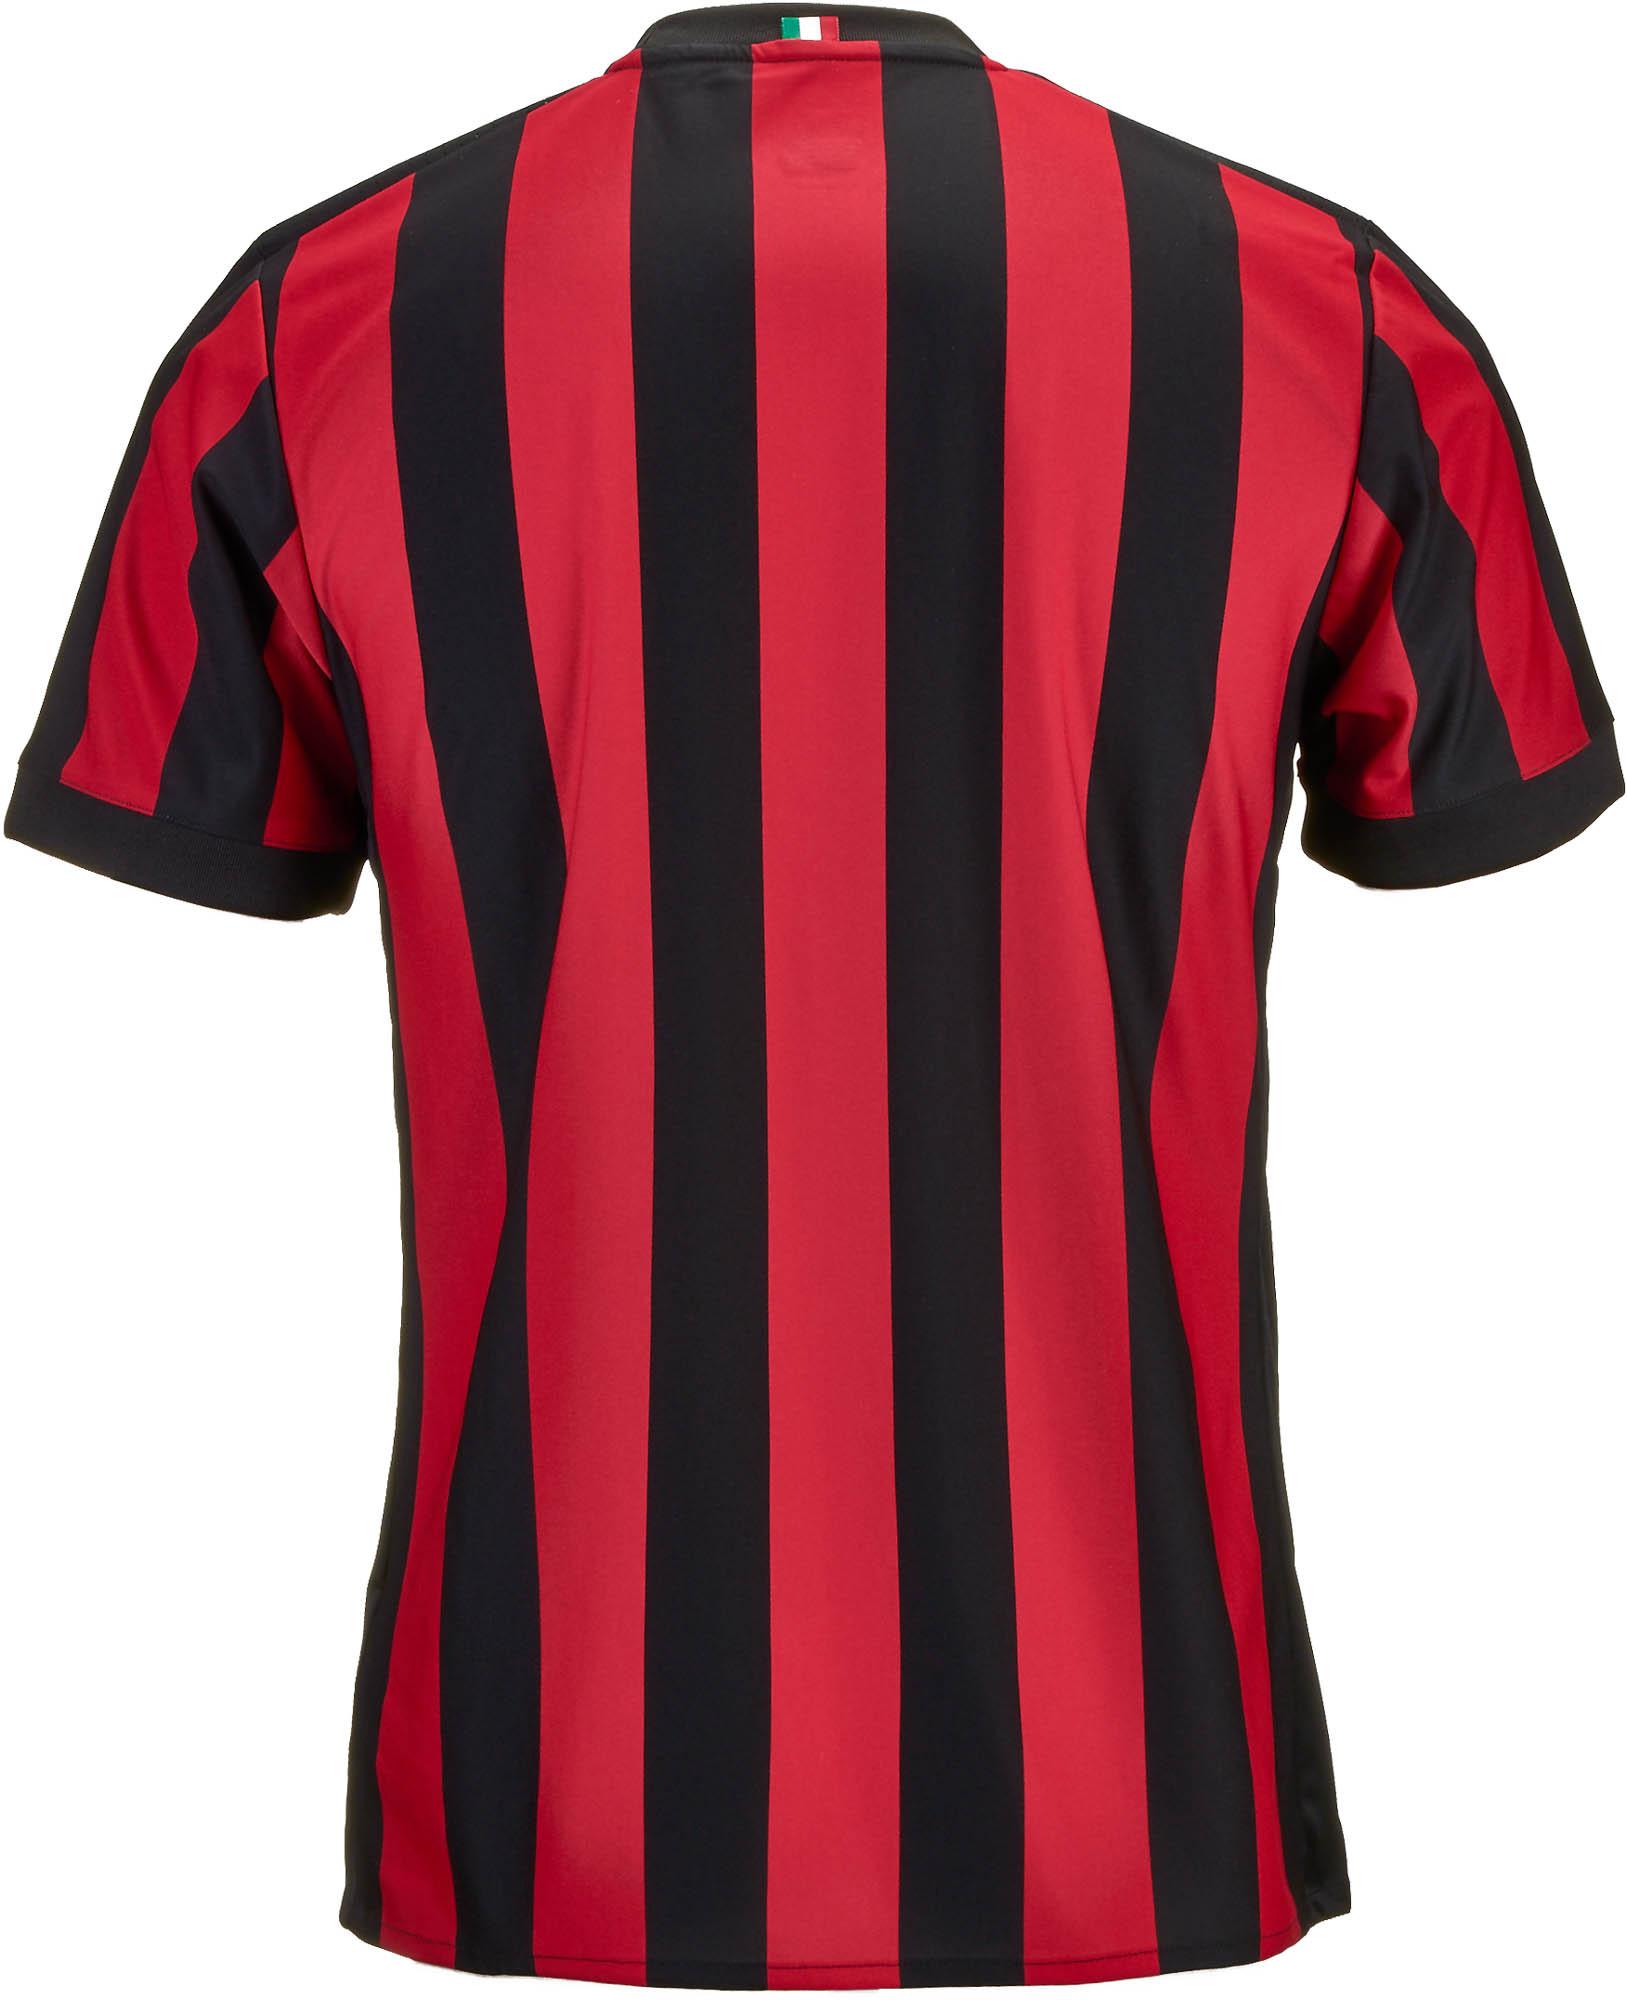 save off 09350 946d0 adidas AC Milan Home Jersey 2017-18 - Soccer Master